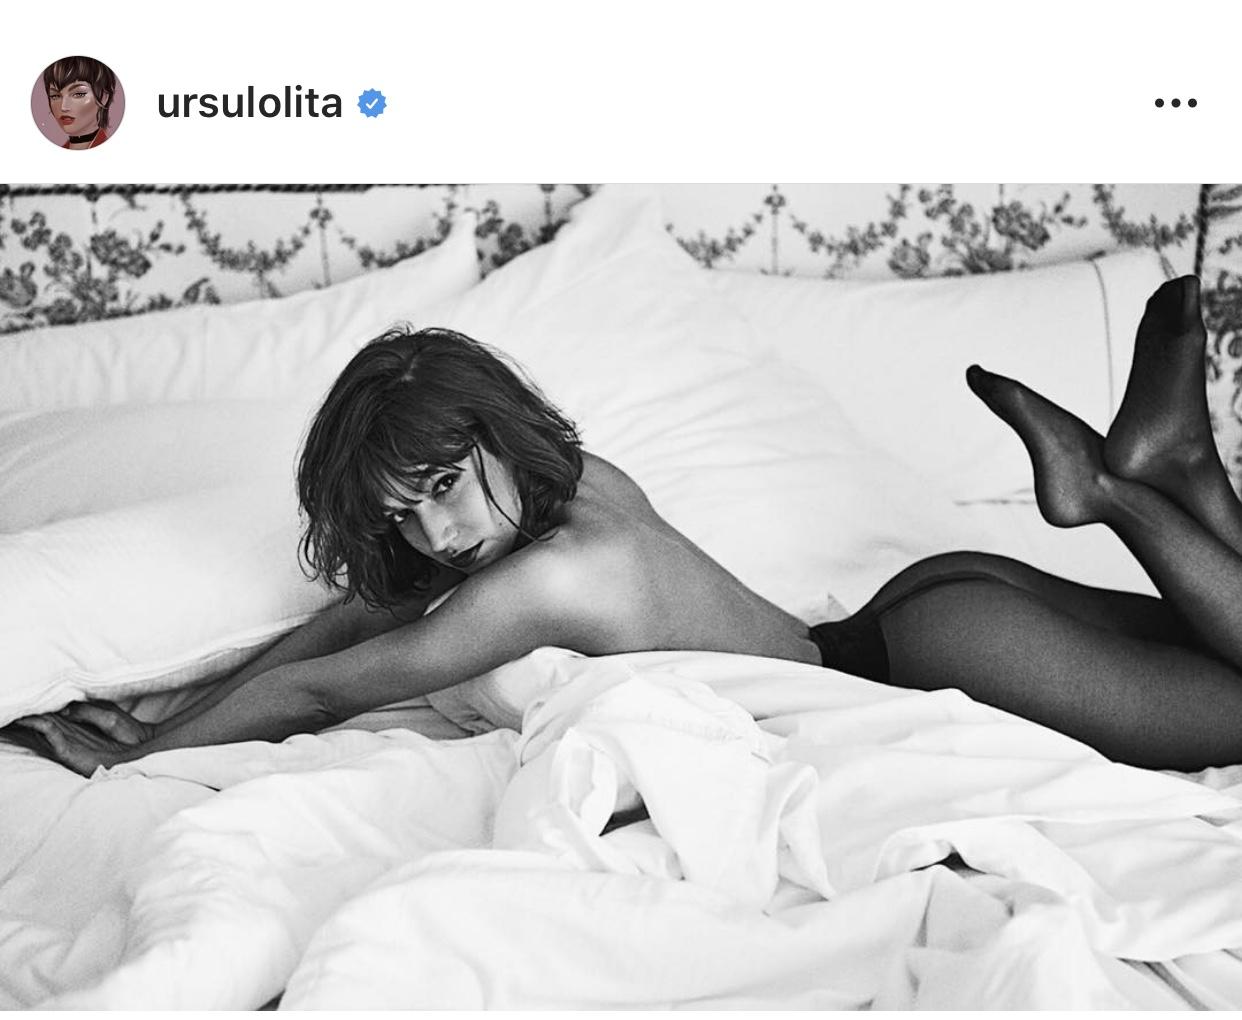 Úrsula Corbero - Instagram